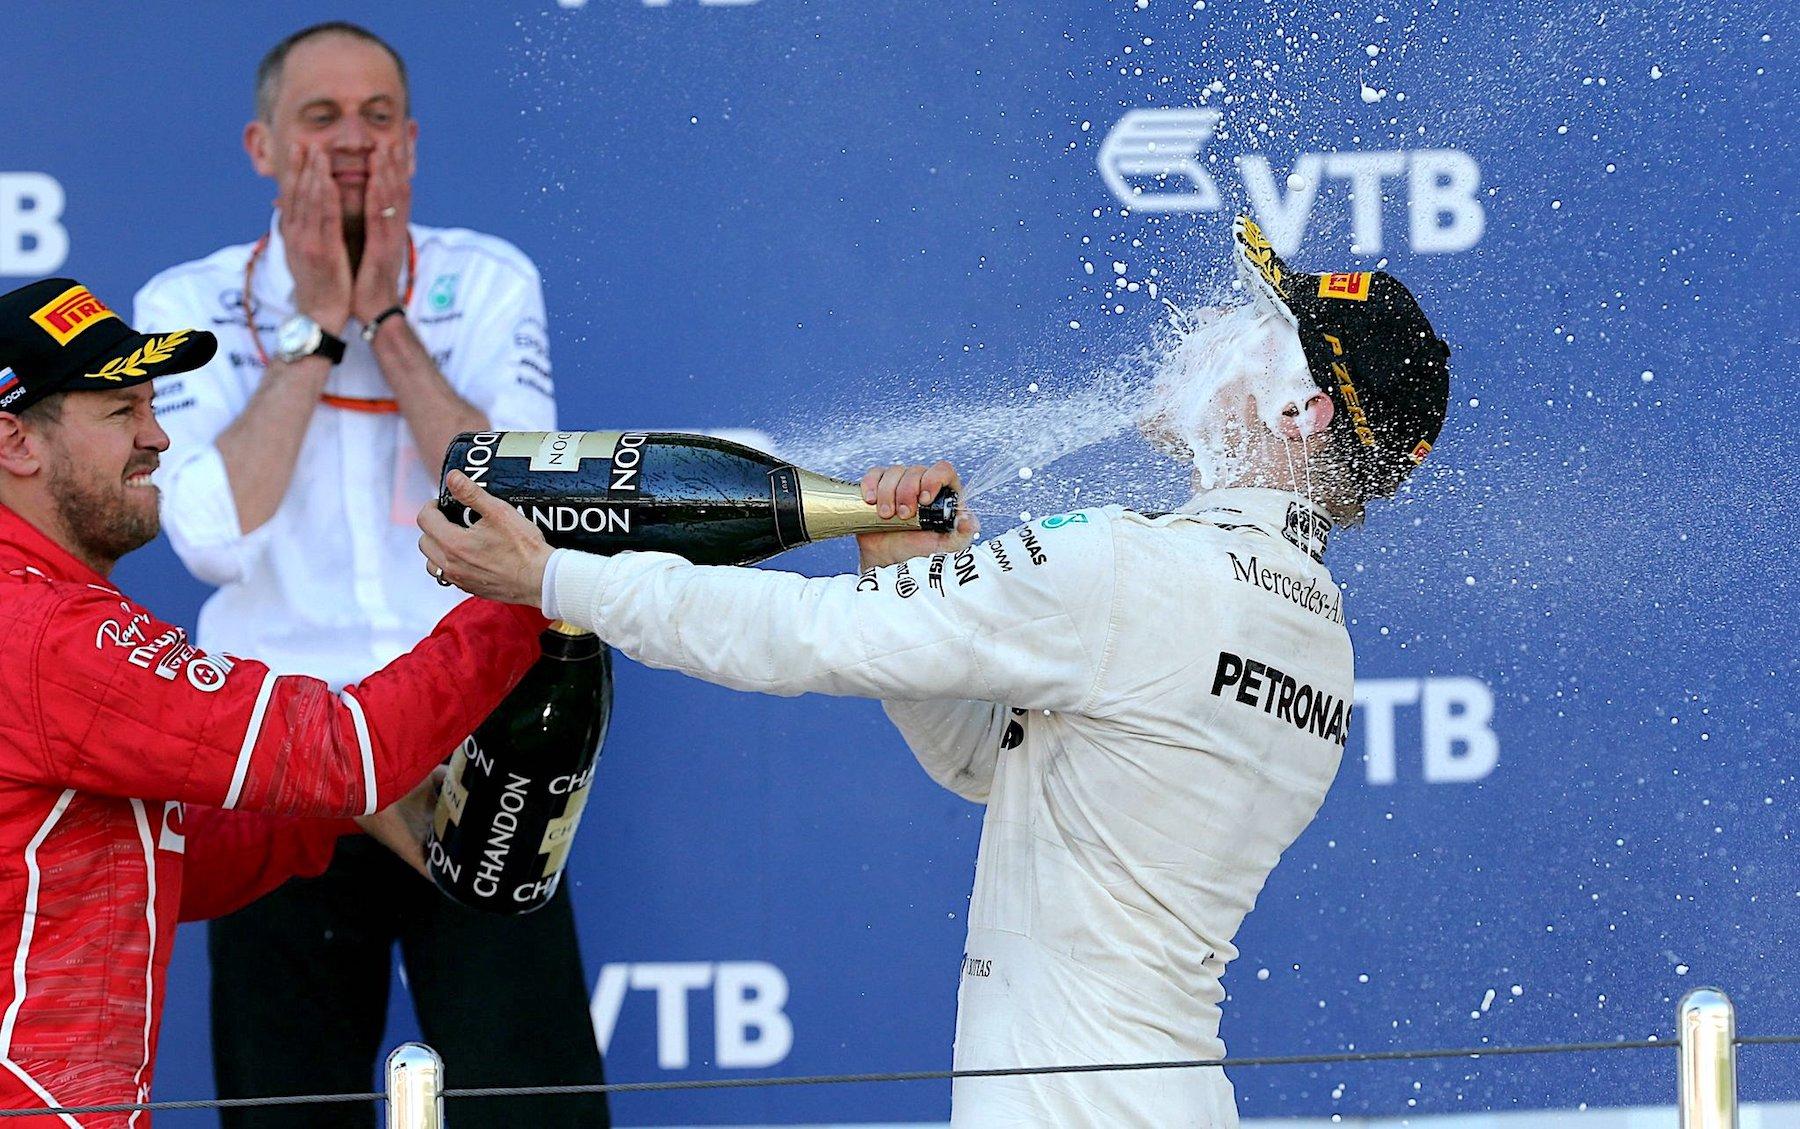 Salracing | 2017 Russian GP podium celebrations